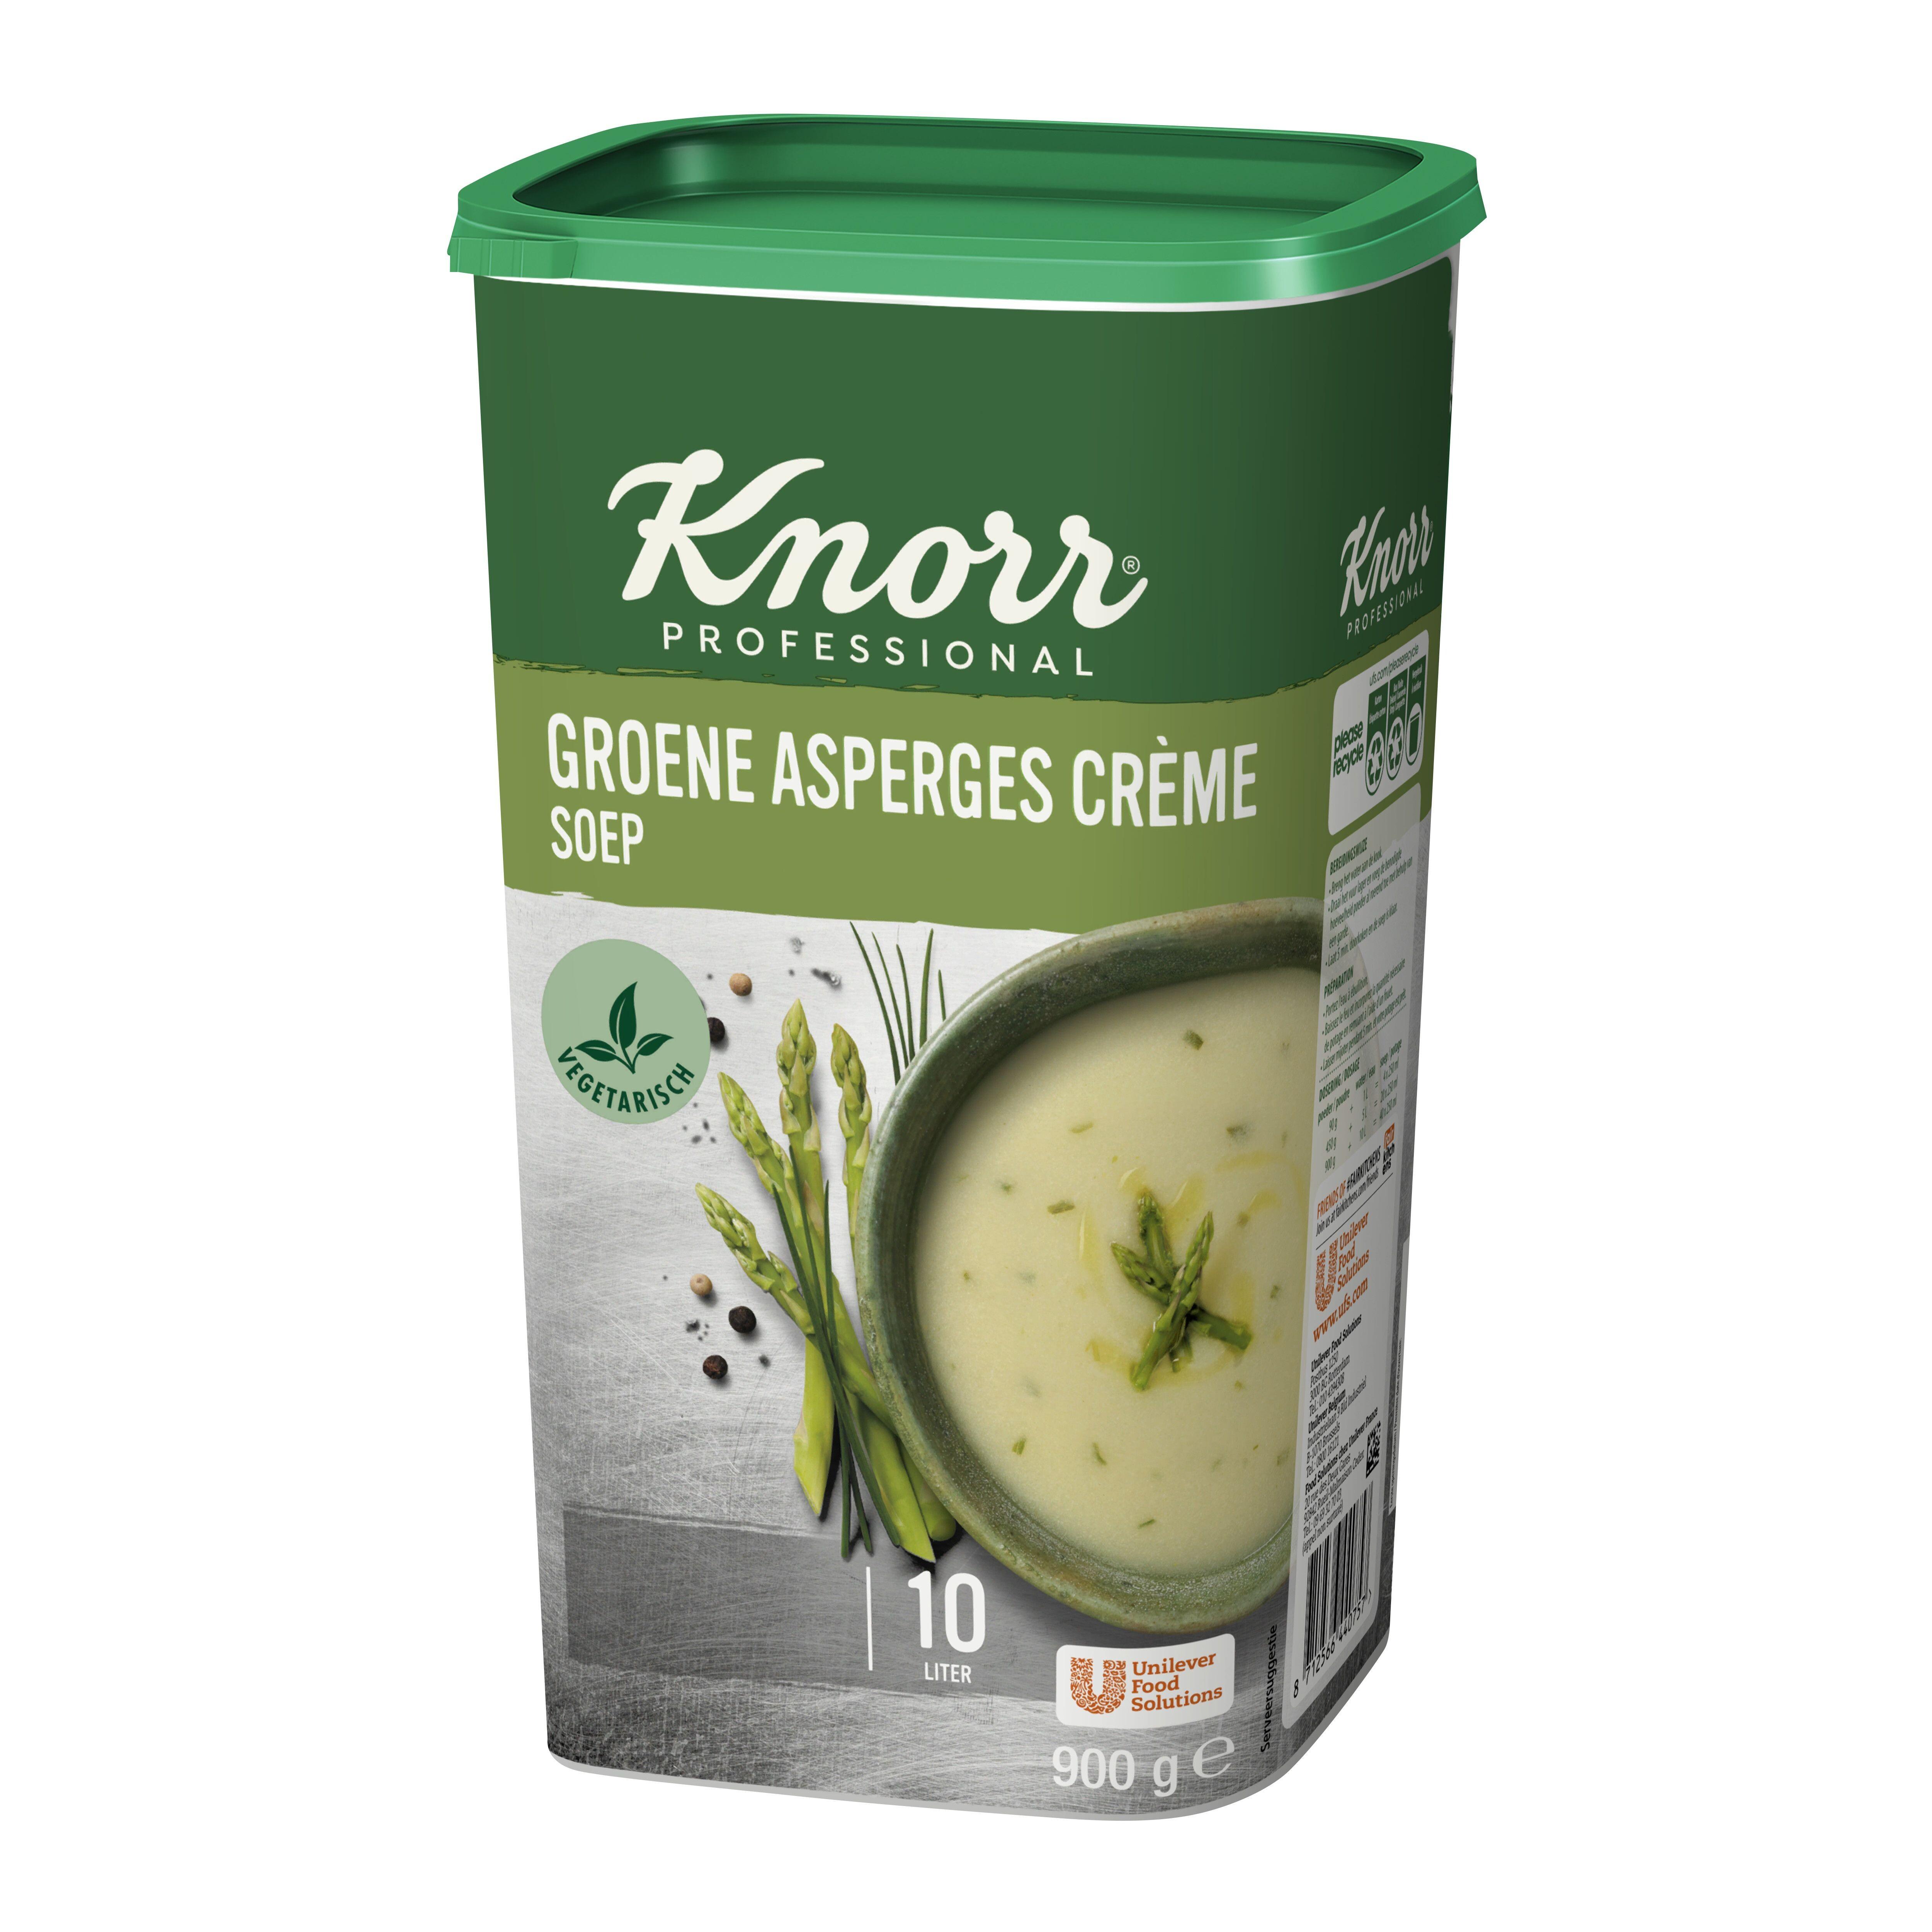 Knorr groene asperges creme soep 0.9kg Professional